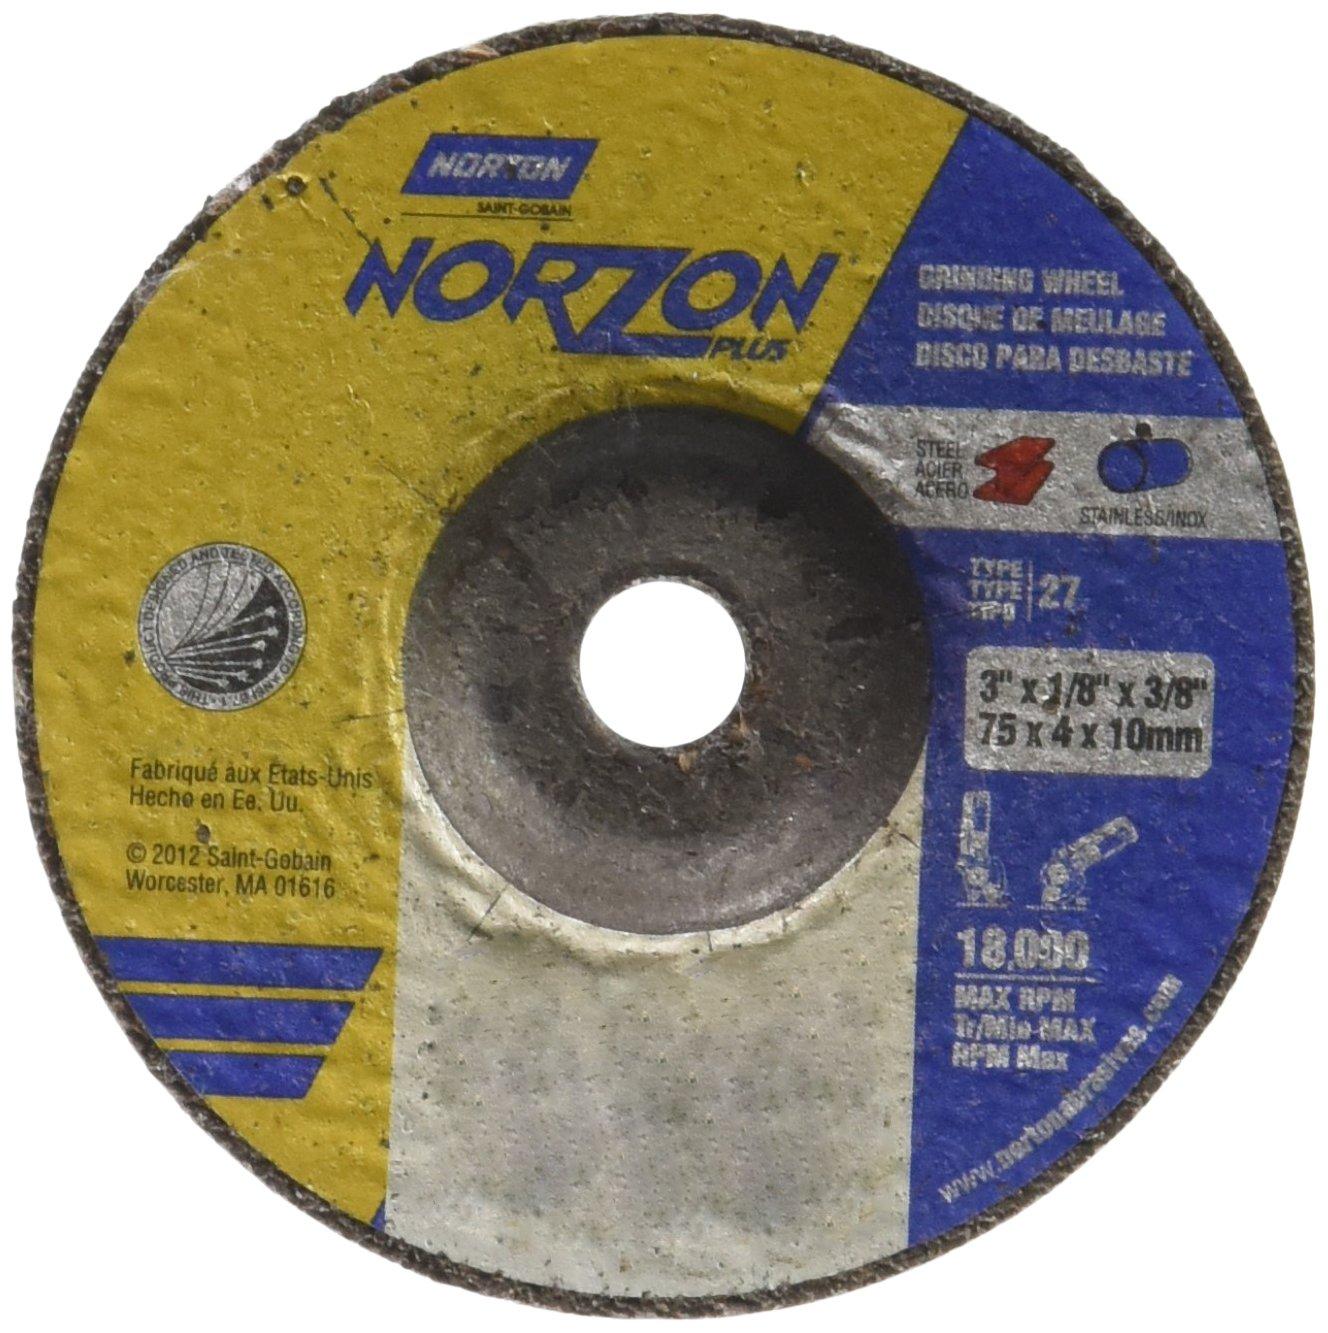 Norton Norzon Plus Depressed Center Abrasive Wheel, Type 27, Zirconia Alumina, 3/8'' Arbor, 3'' Diameter x 1/8'' Thickness (Pack of 25)